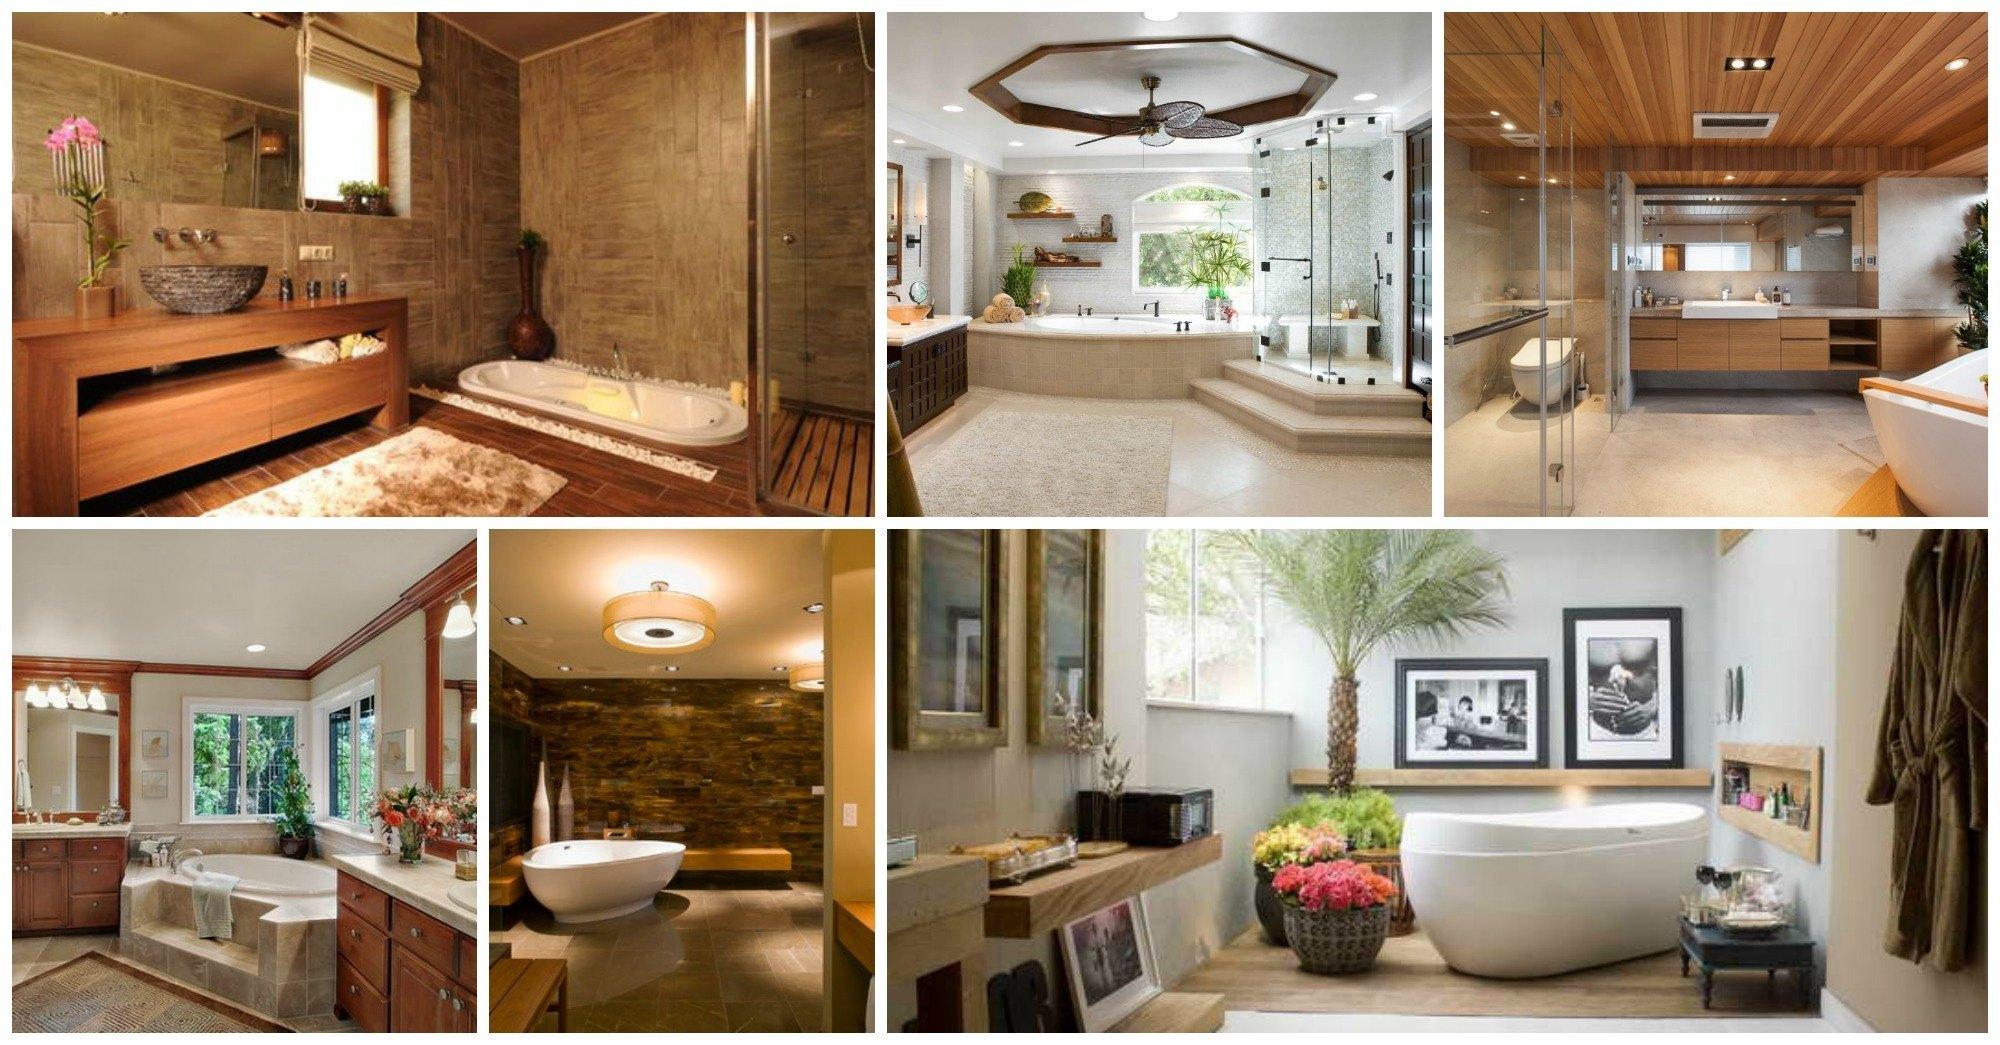 10 Amazing Ways to Make Your Bathroom Feel More Spa – Like